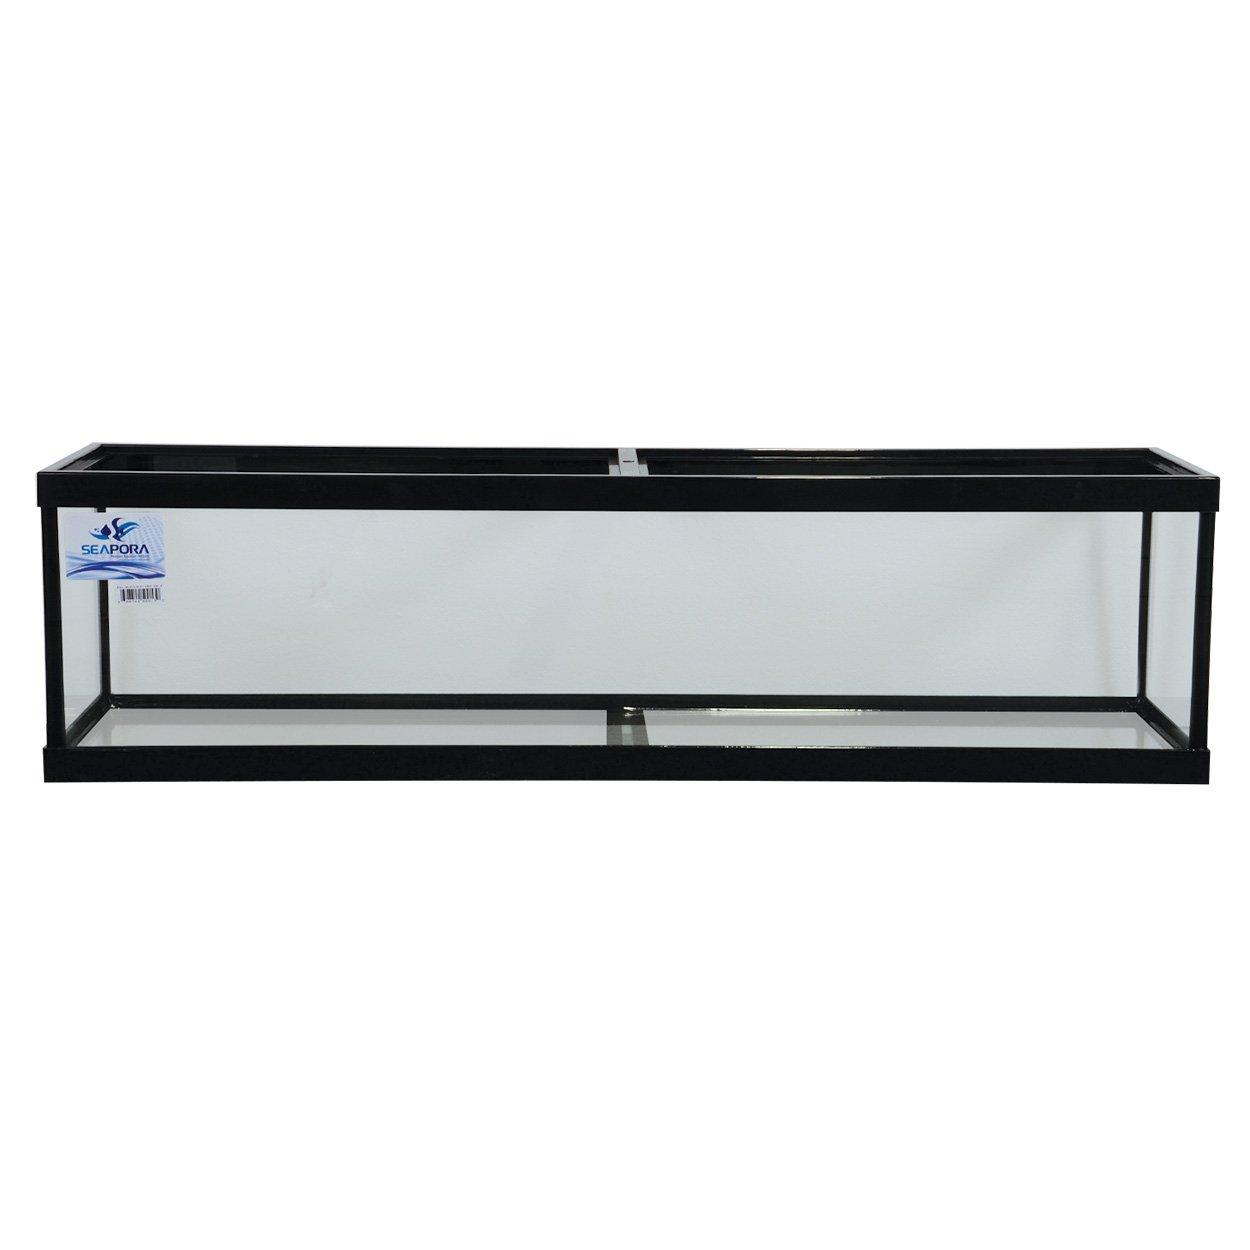 Seapora 59206 Standard Long Aquarium, 33 gallon